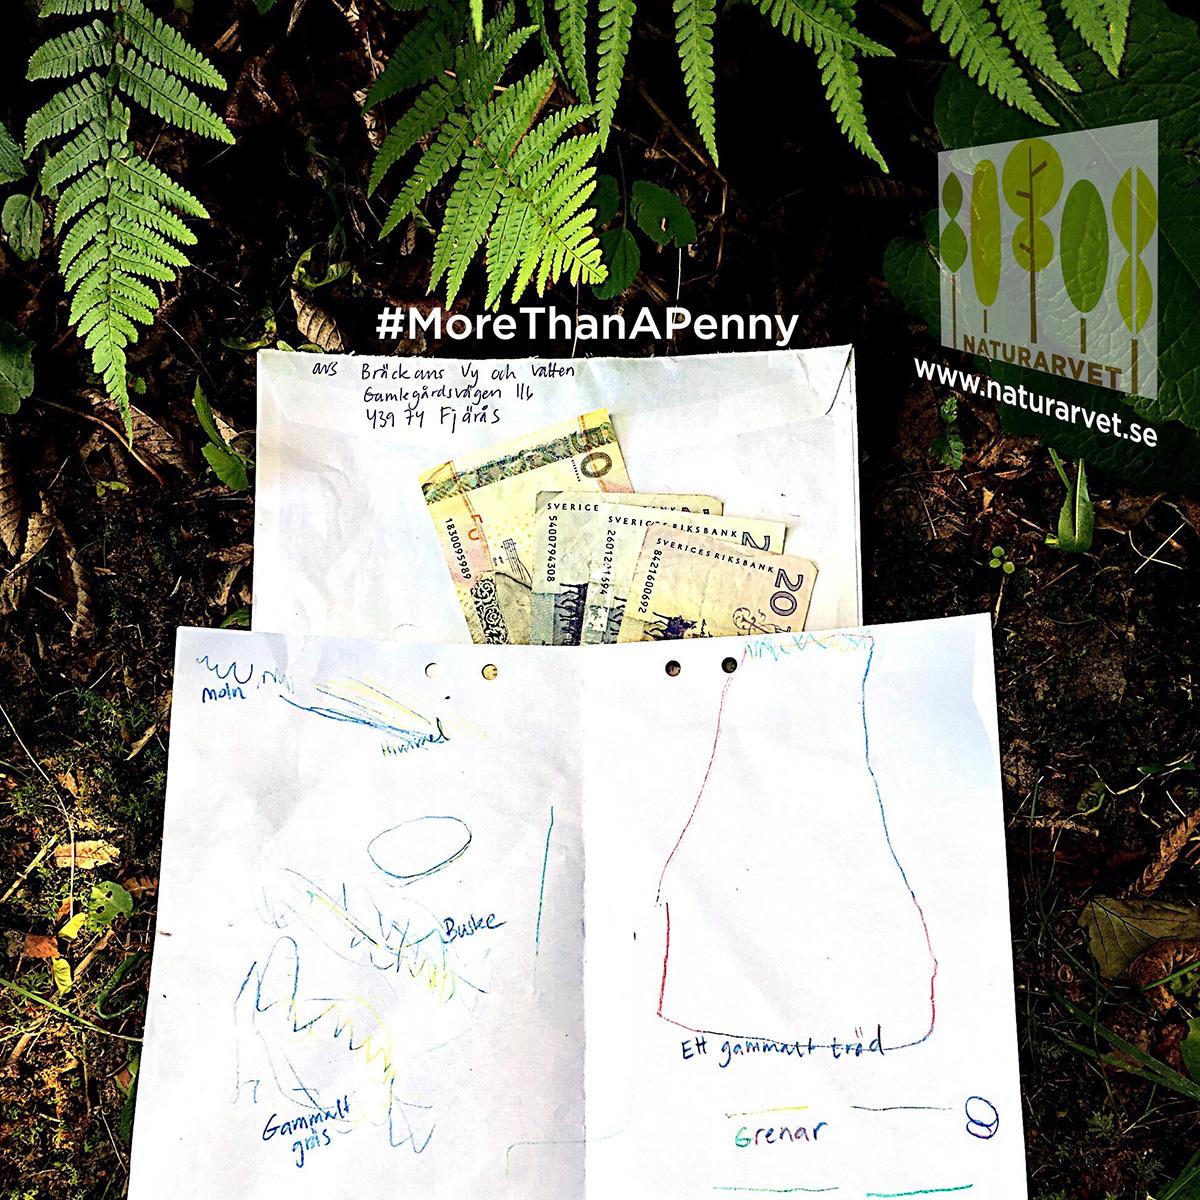 100 kronor ger evigt skydd för 10 kvm gammelskog